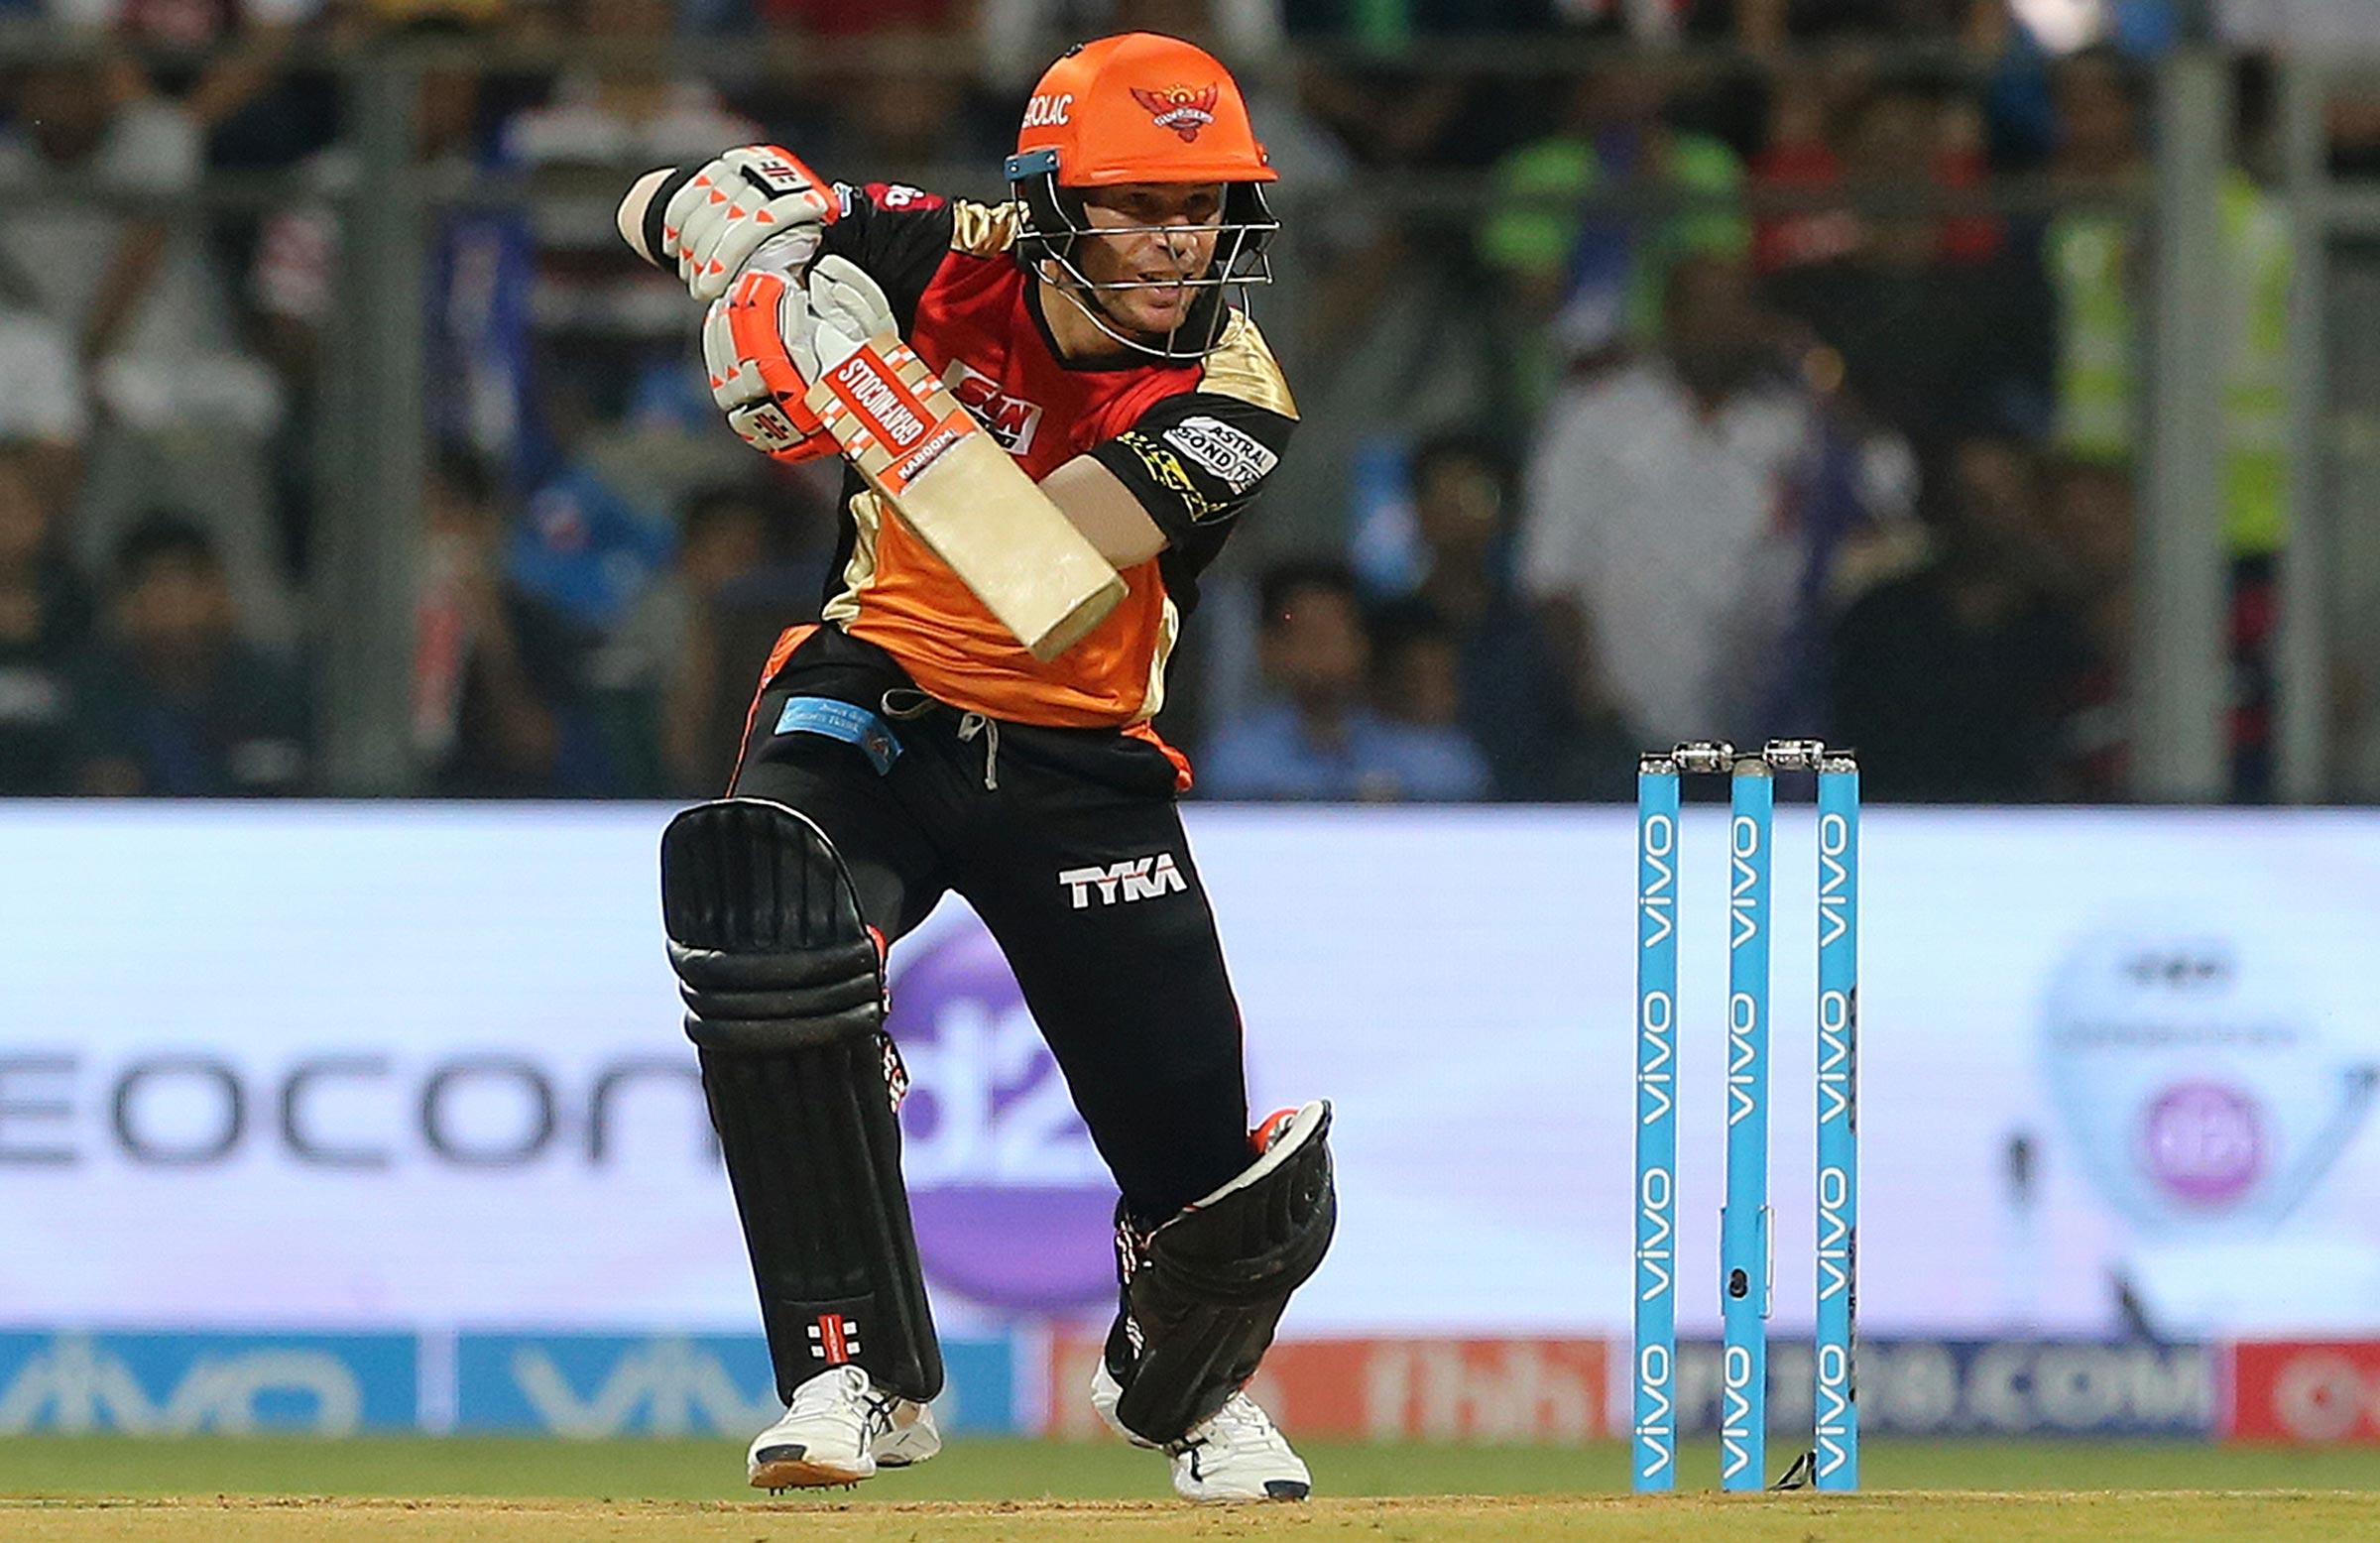 David Warner is back at the Sunrisers Hyderabad // Getty